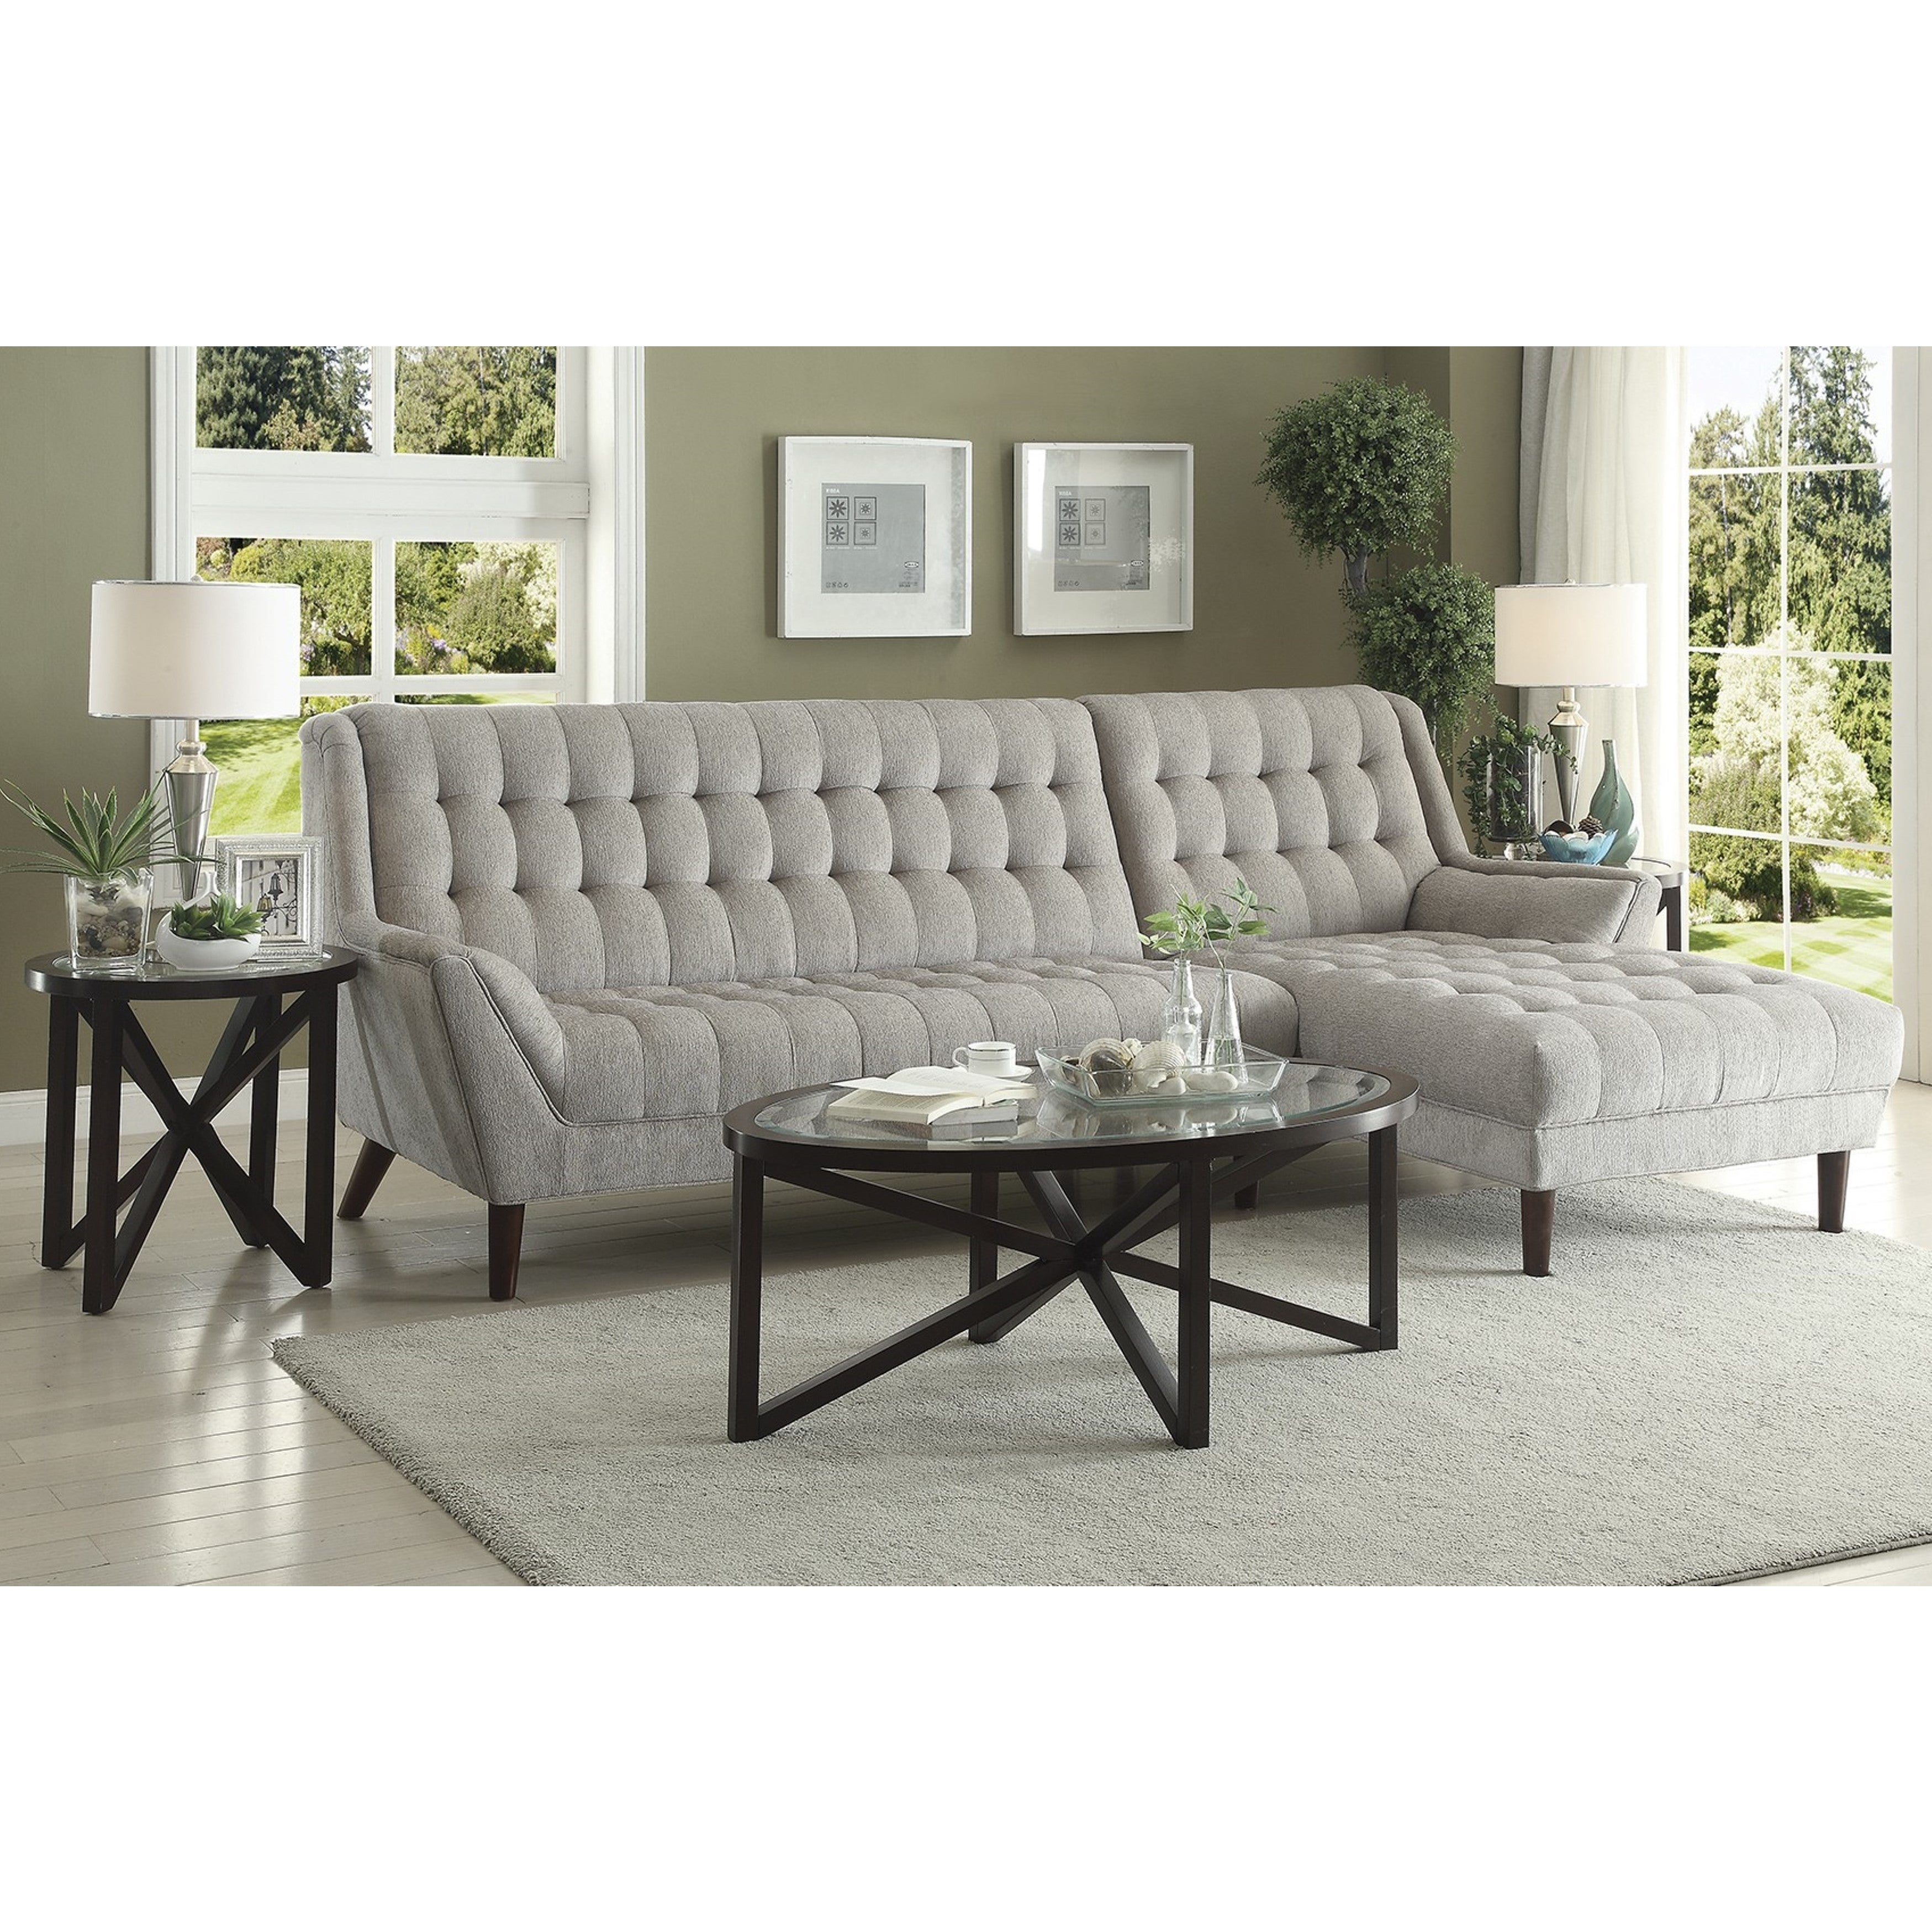 Retro Mid Century Modern Style Grey Living Room Sectional Sofa